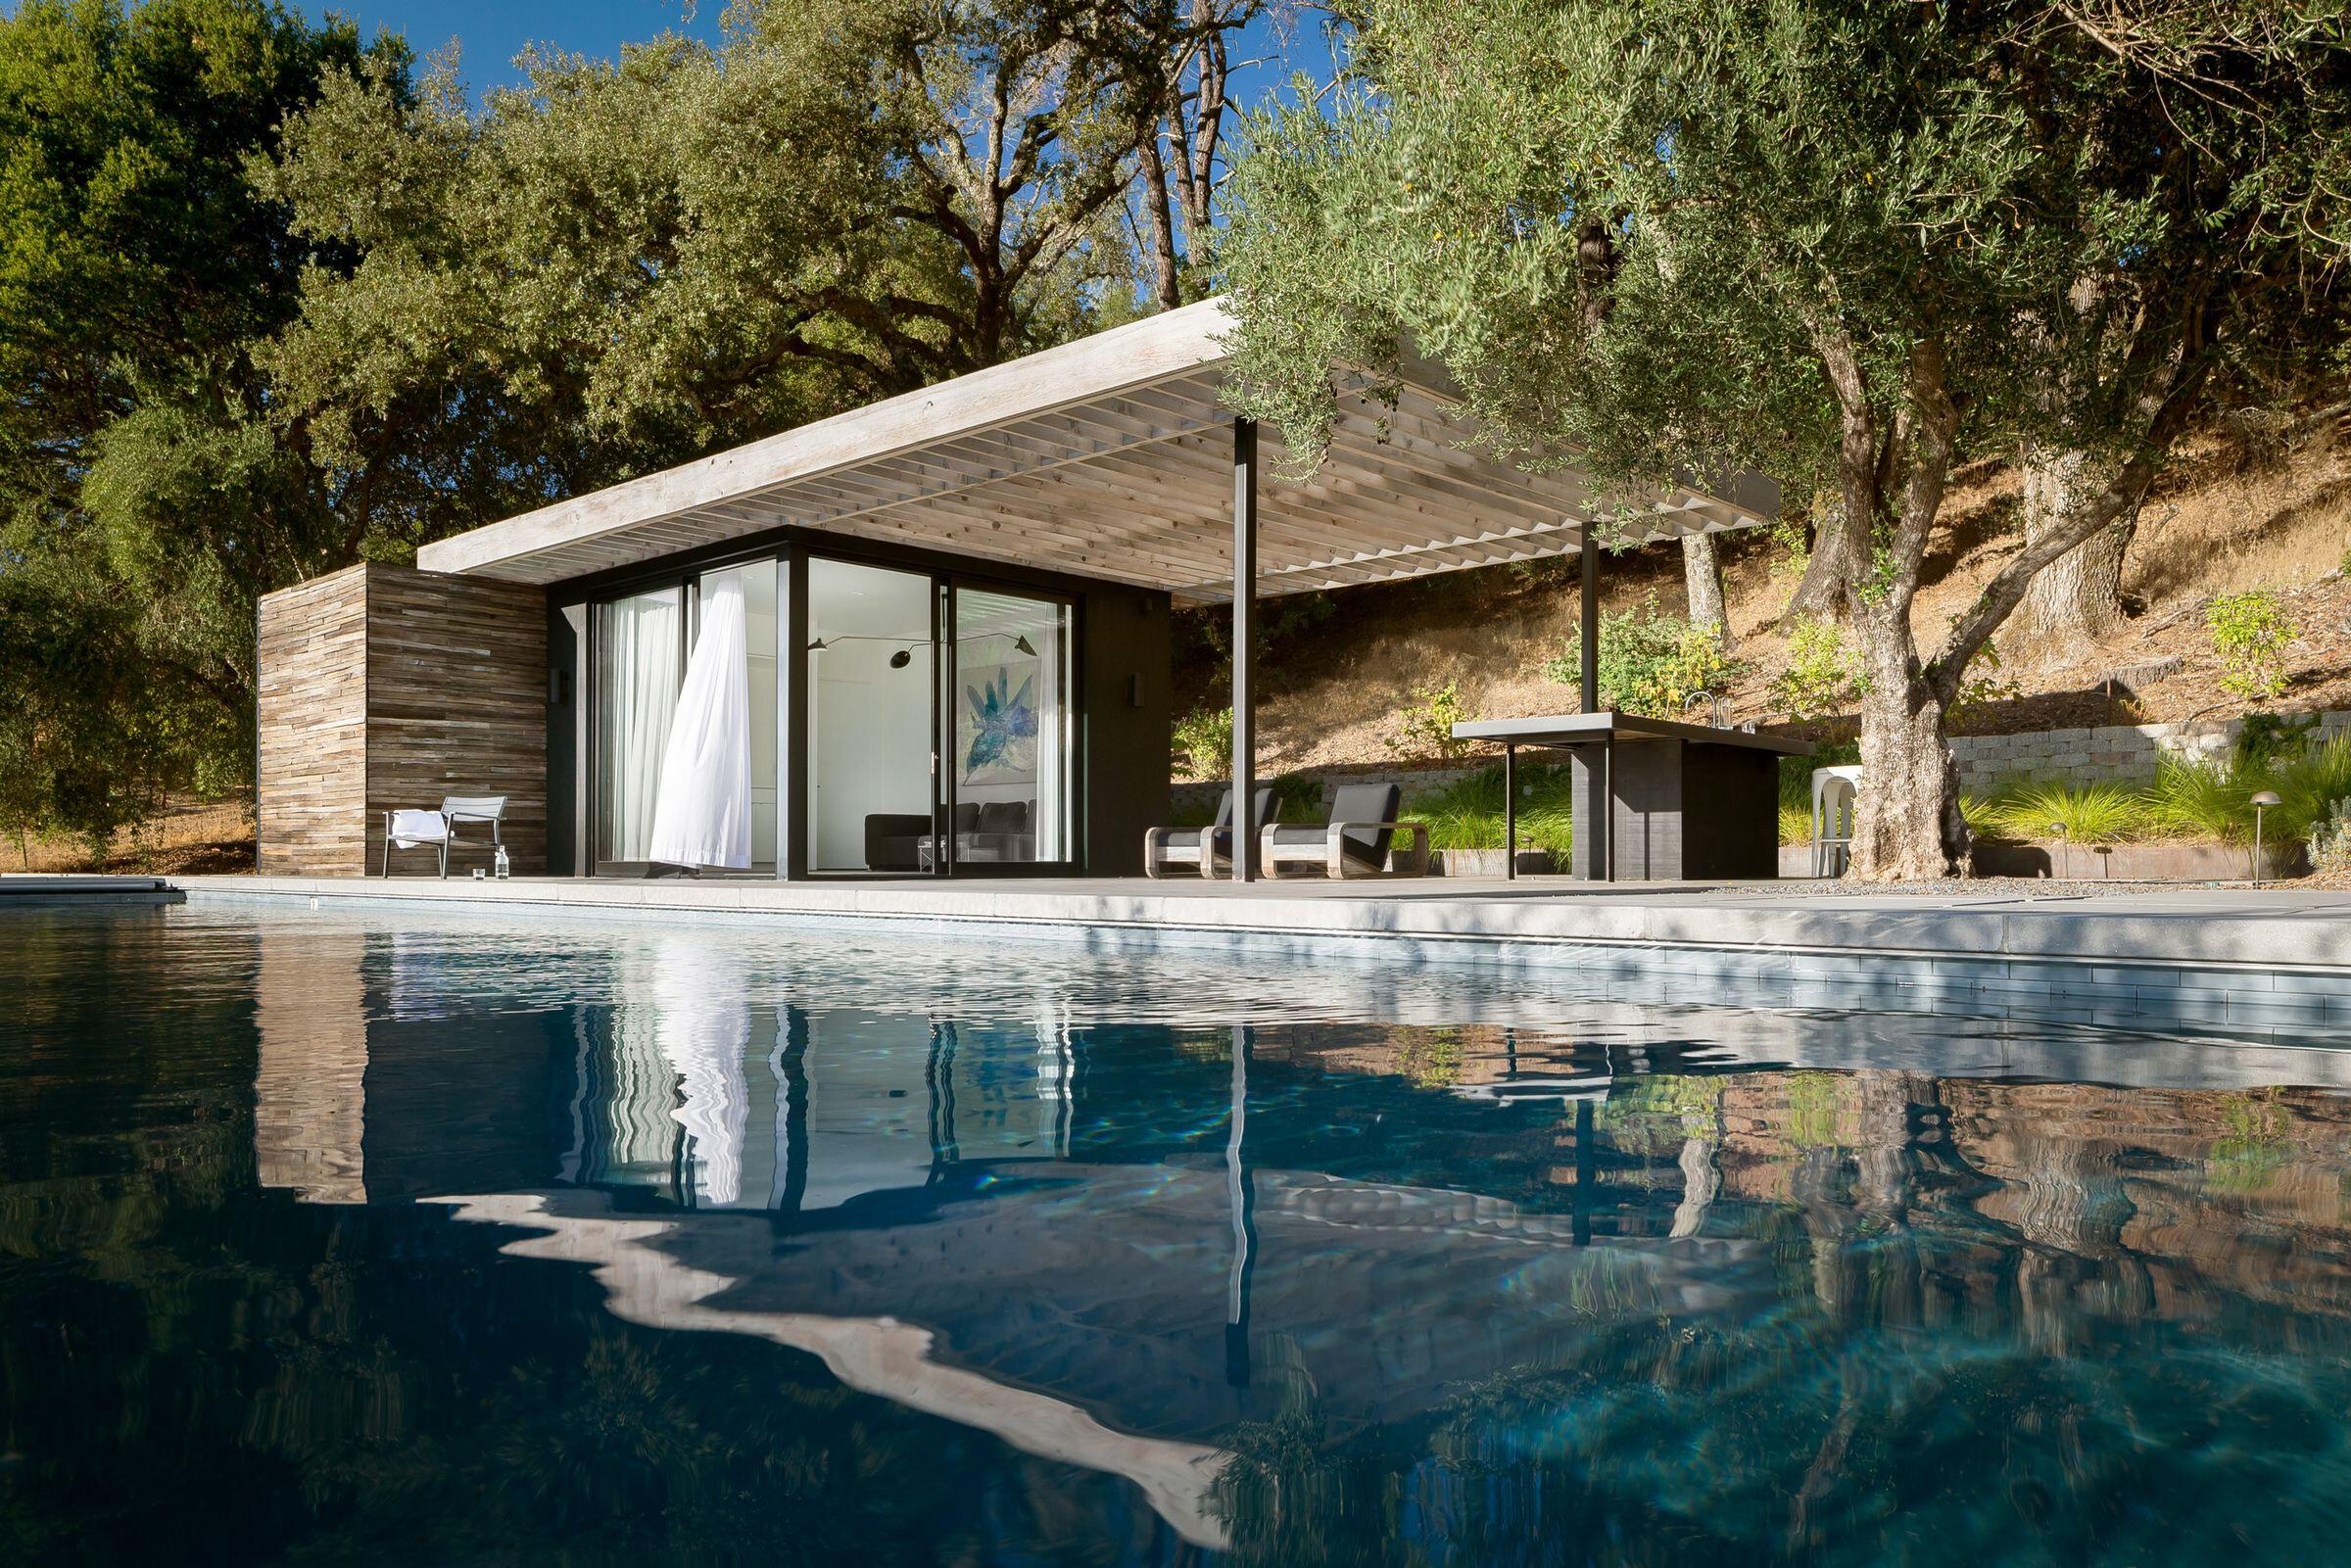 Dry Creek Poolhouse